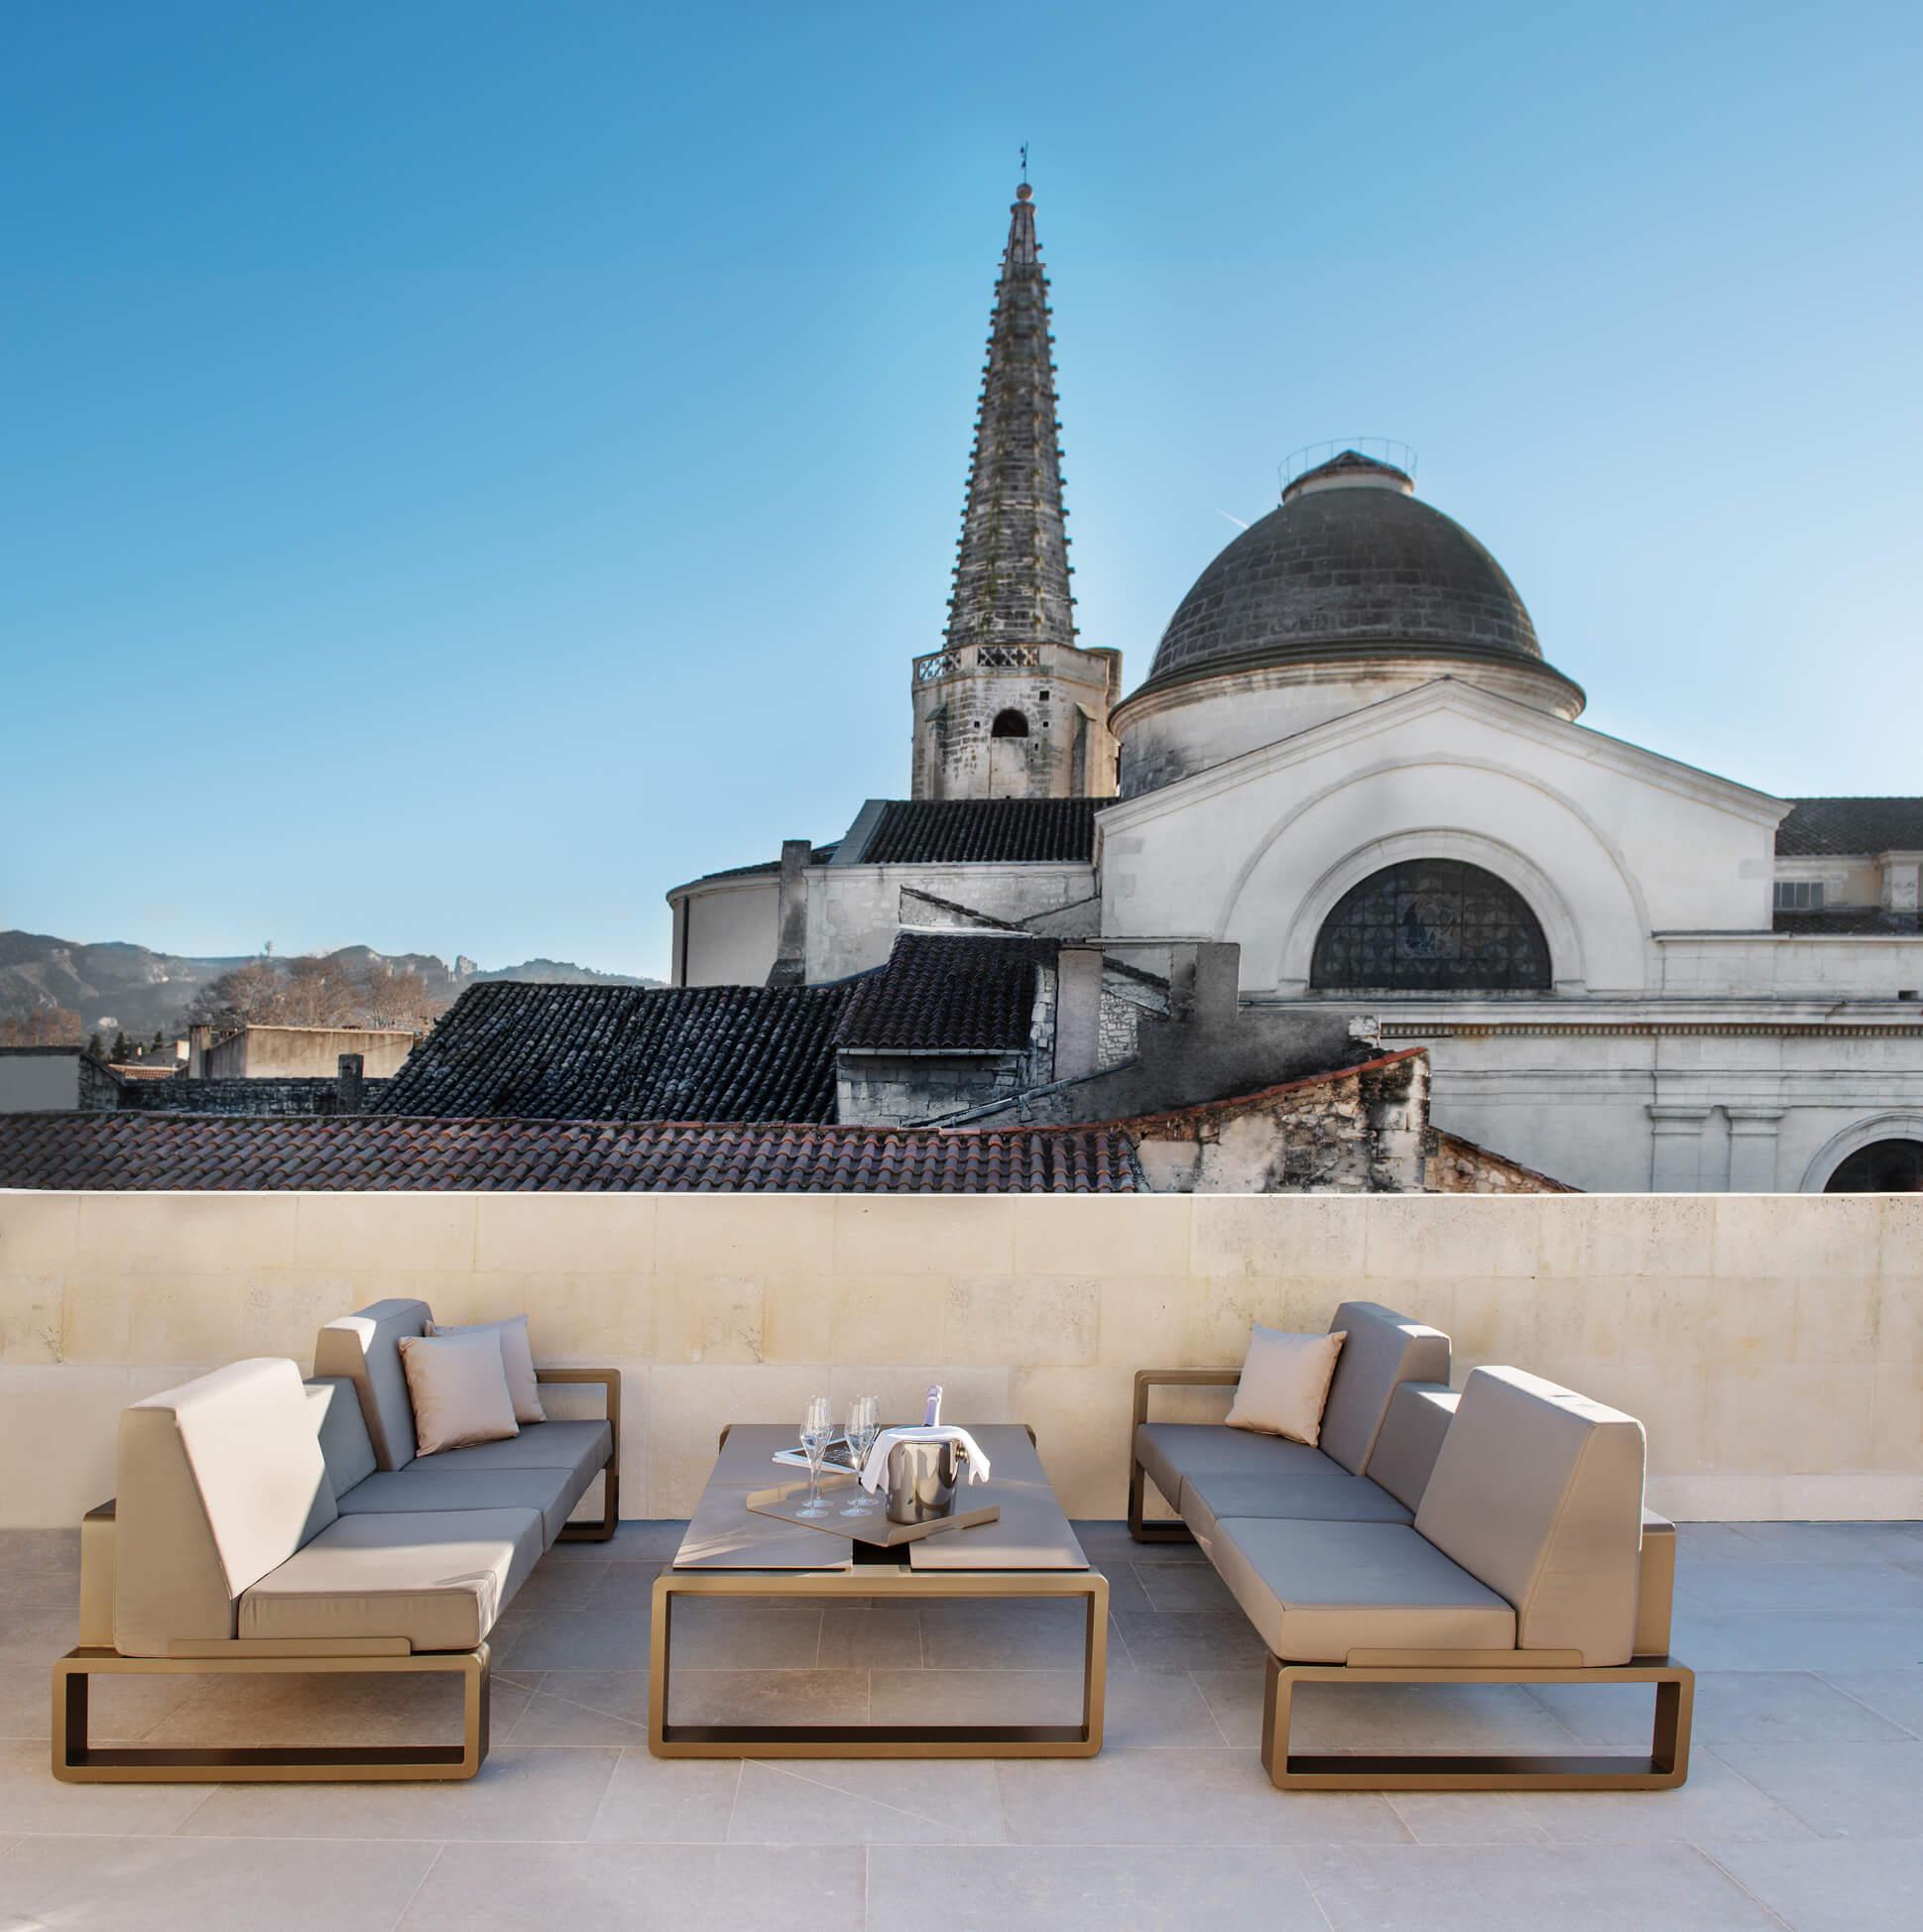 hotel-de-tourrel_roof-terrace_2.jpg